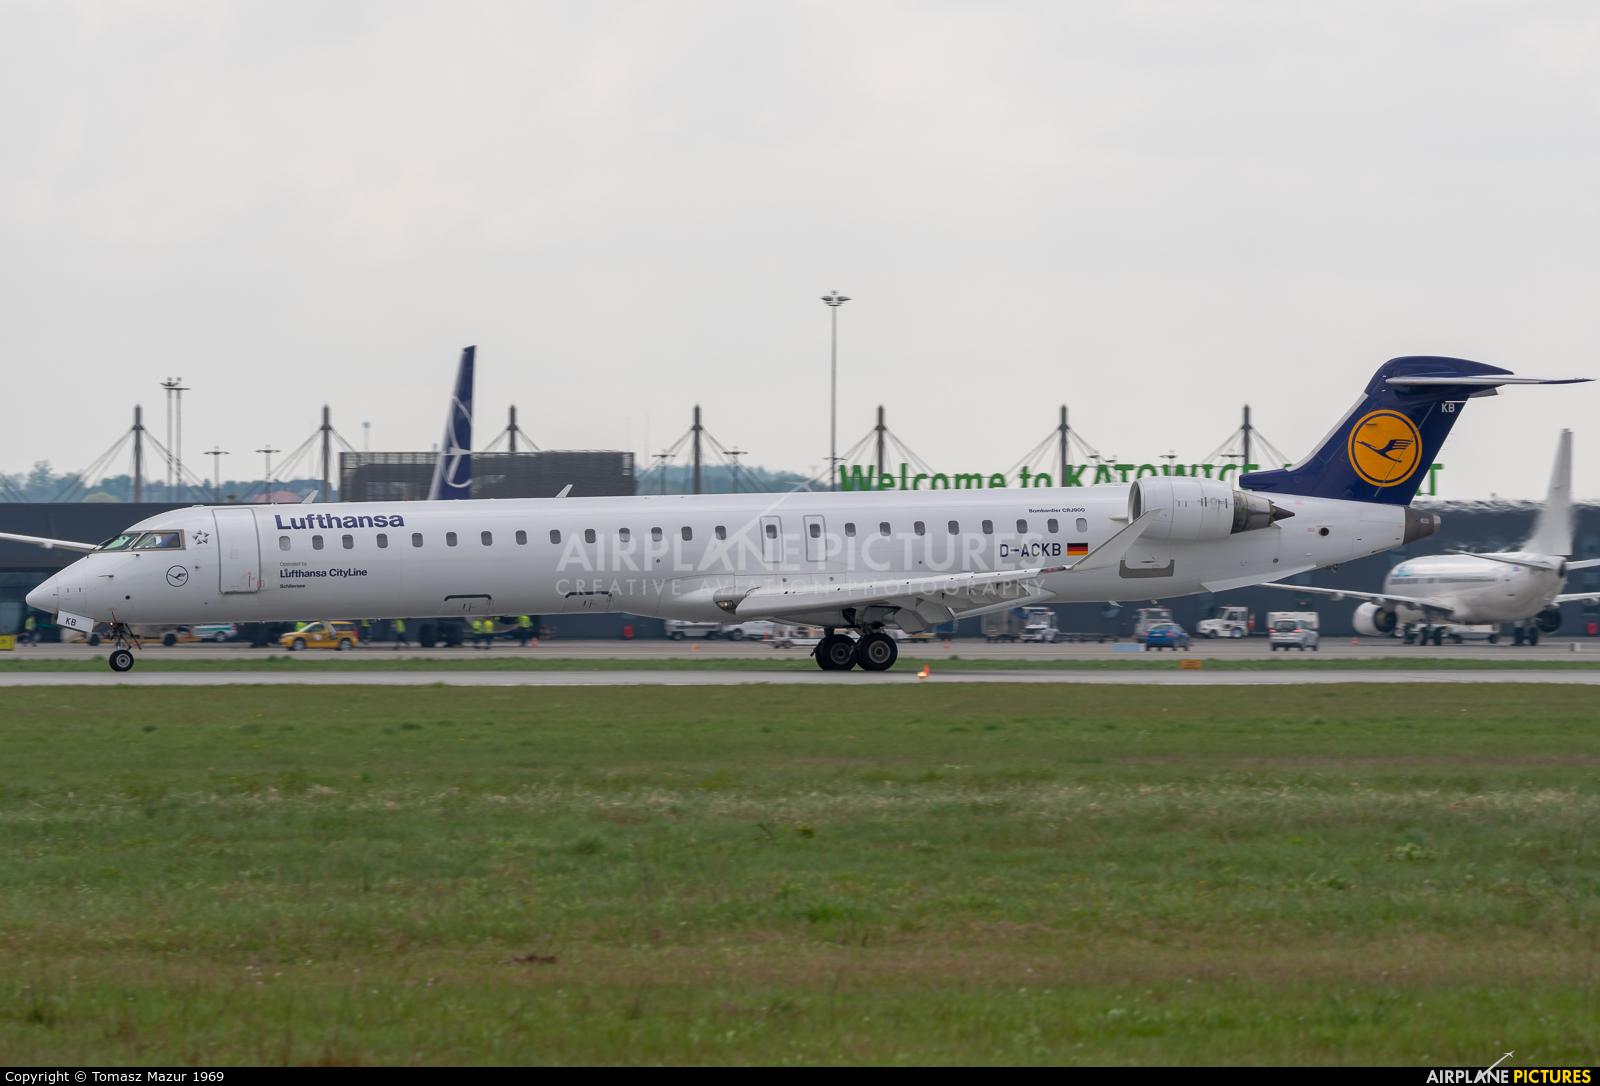 Lufthansa Regional - CityLine D-ACKB aircraft at Katowice - Pyrzowice